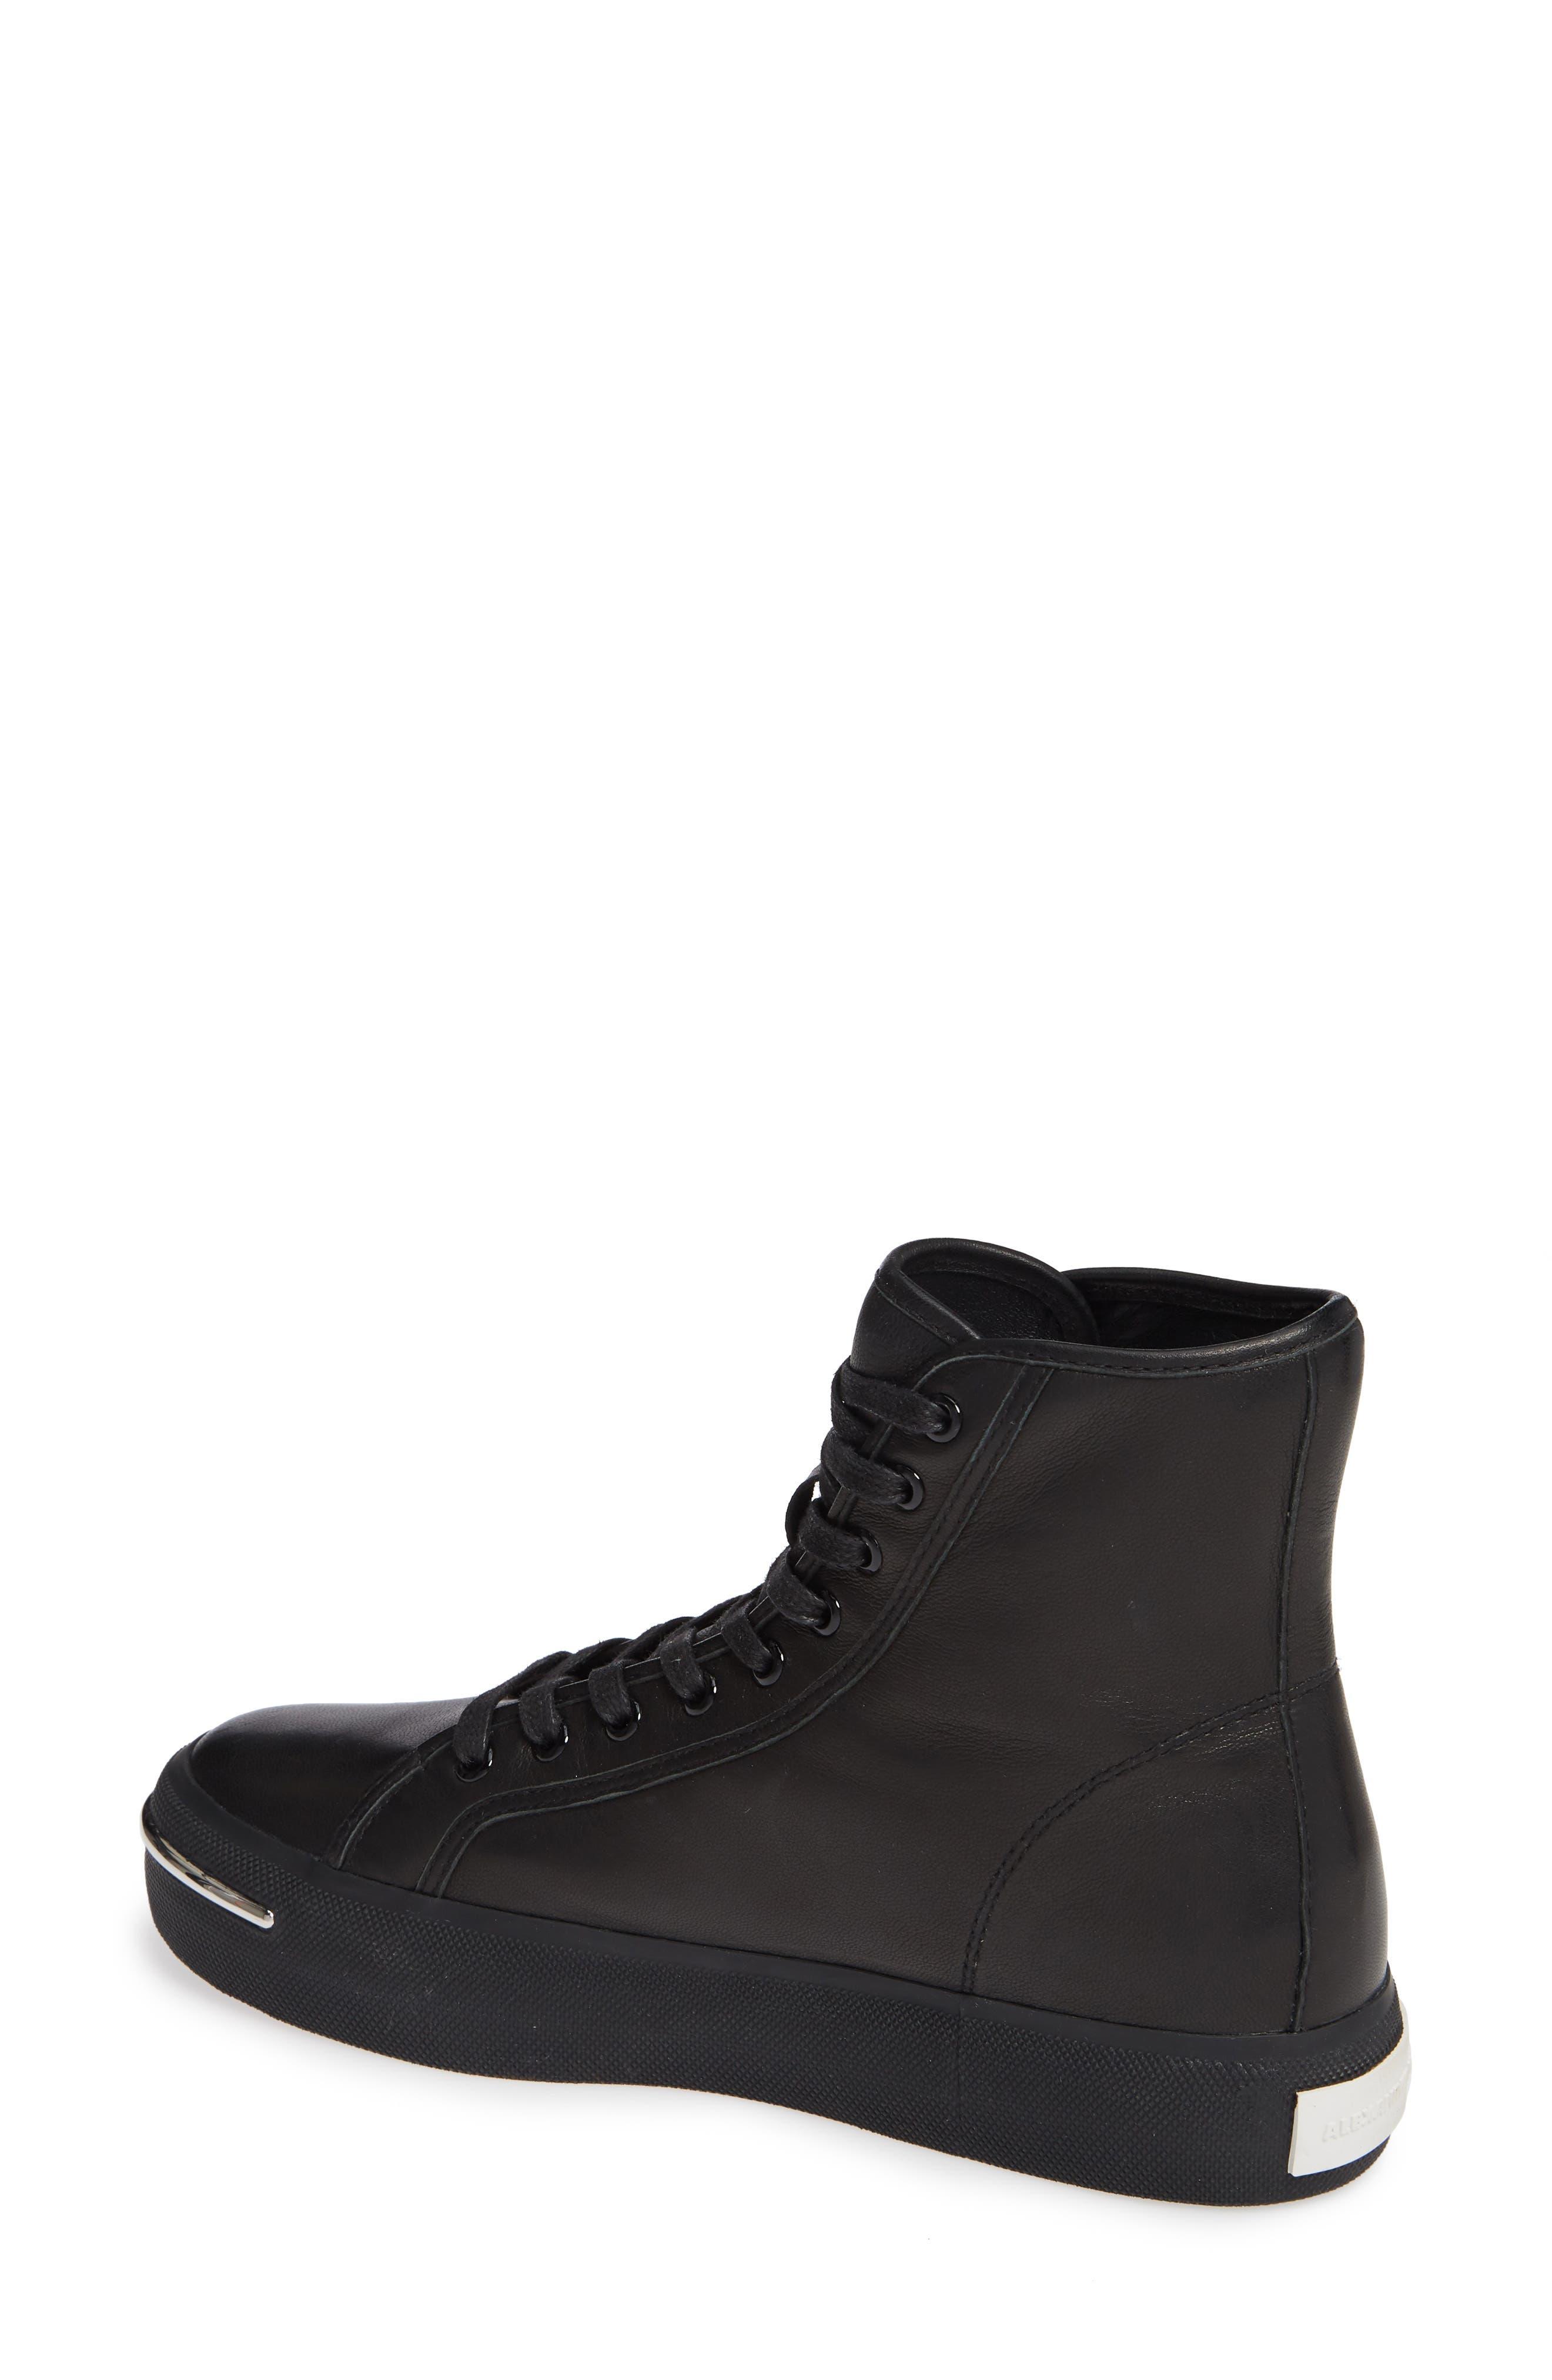 ALEXANDER WANG, Pia High Top Sneaker, Alternate thumbnail 2, color, BLACK